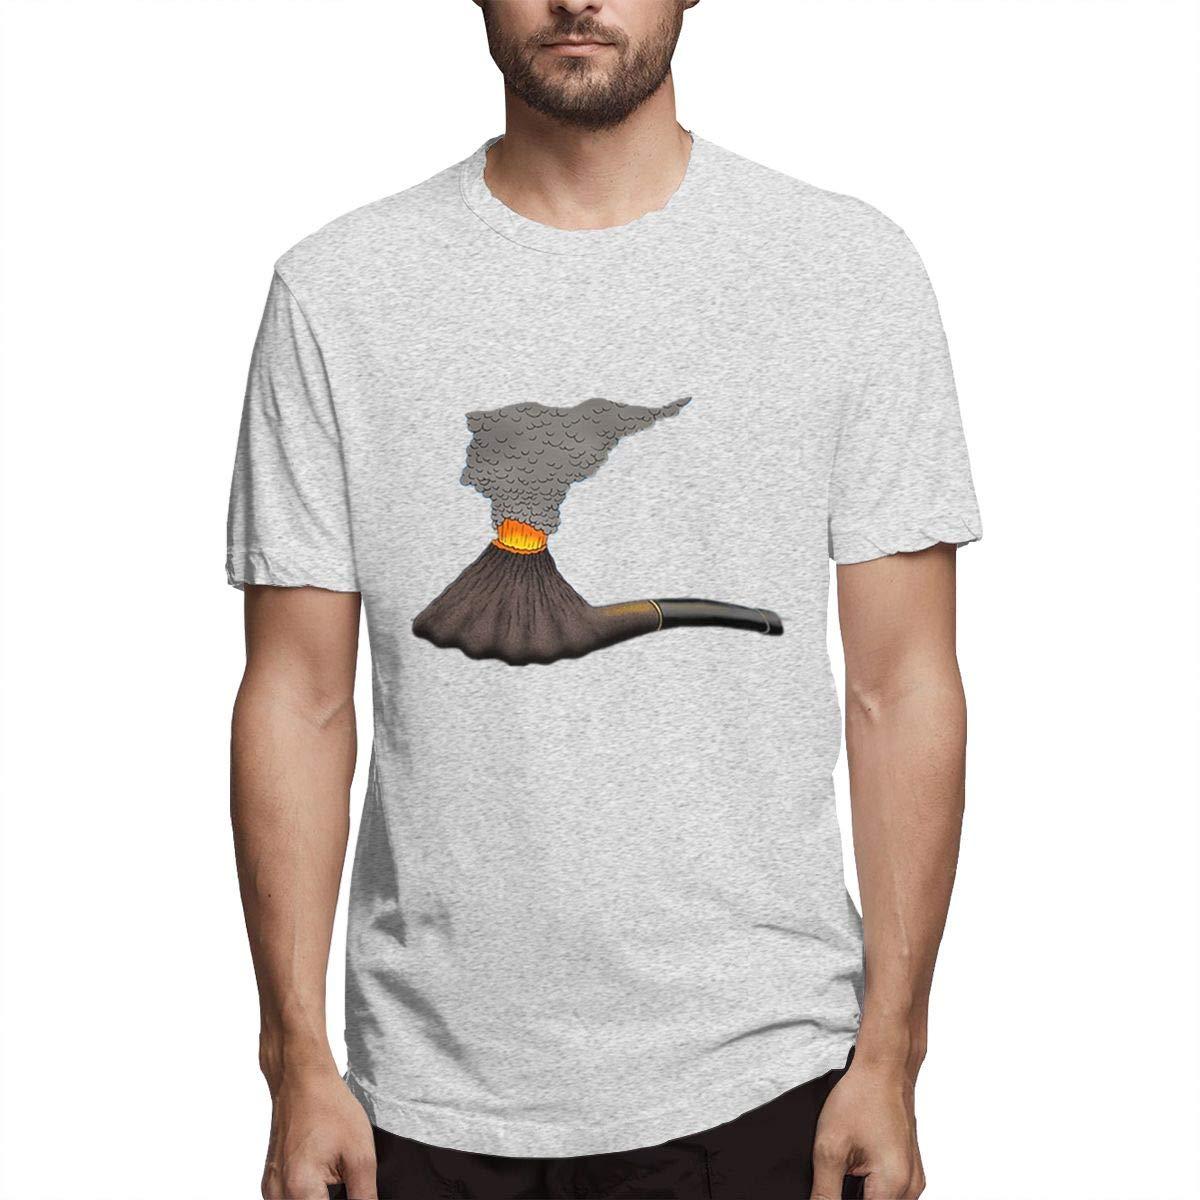 Amazon com: LANBRELLA Mens A Smoking Tobacco Pipe Sweat T-Shirt